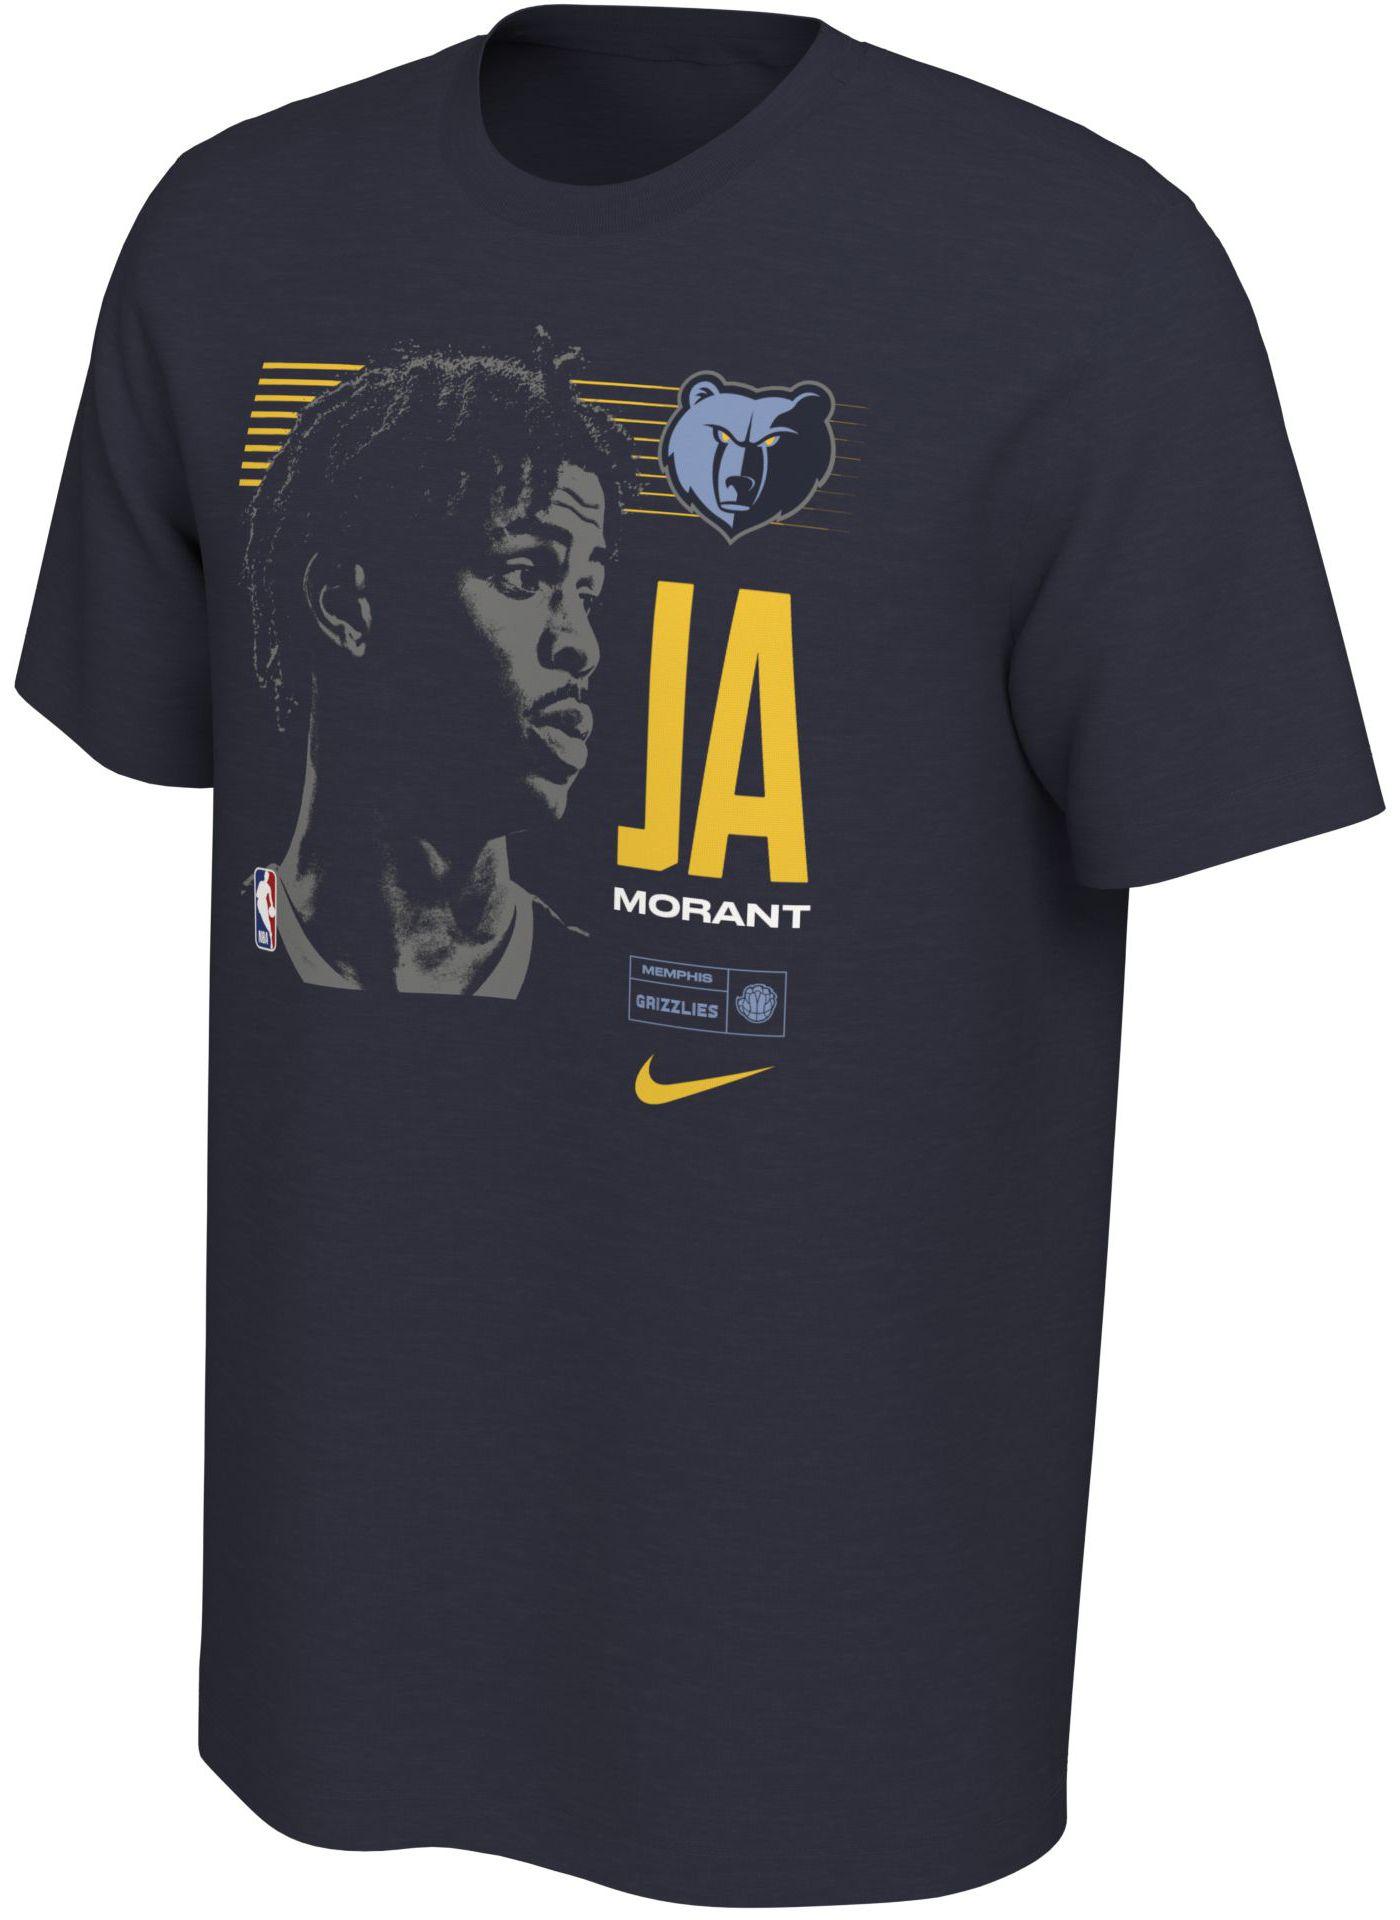 Nike Youth Memphis Grizzlies Ja Morant Dri-FIT T-Shirt